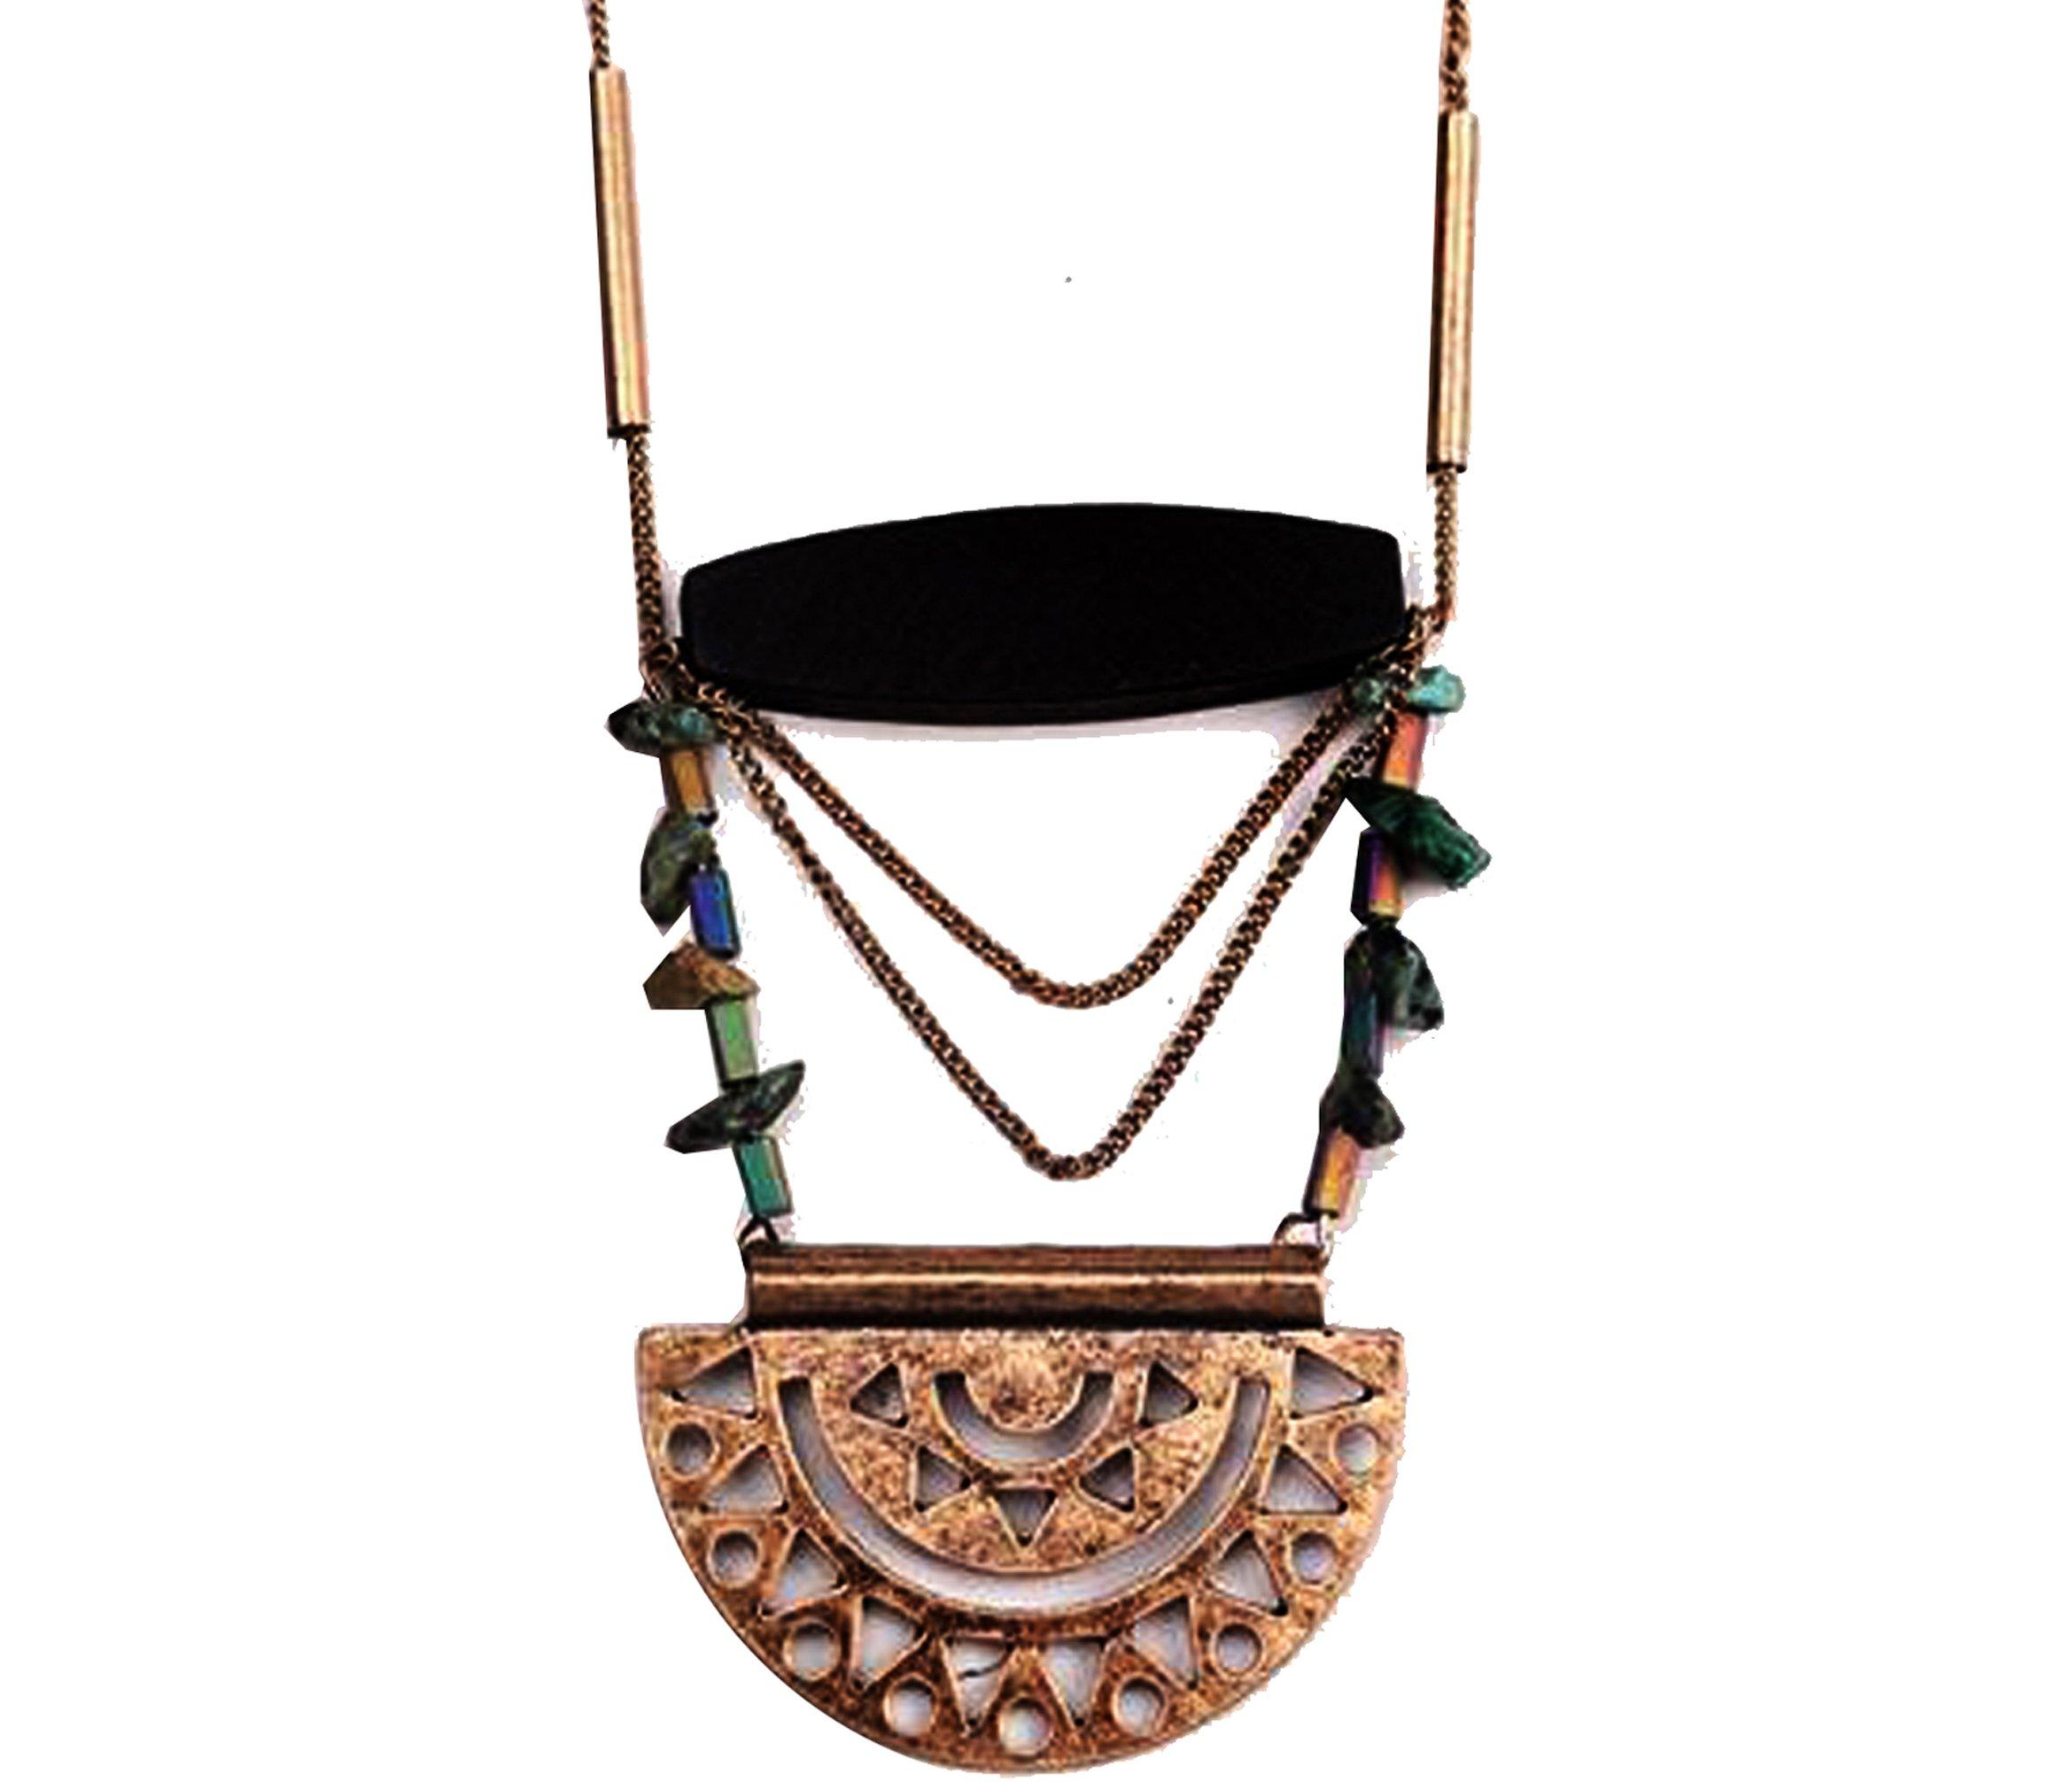 Bohemian Long mixed metal Retro Lock pendant Necklace by HIYOU-Home(Retro lock)